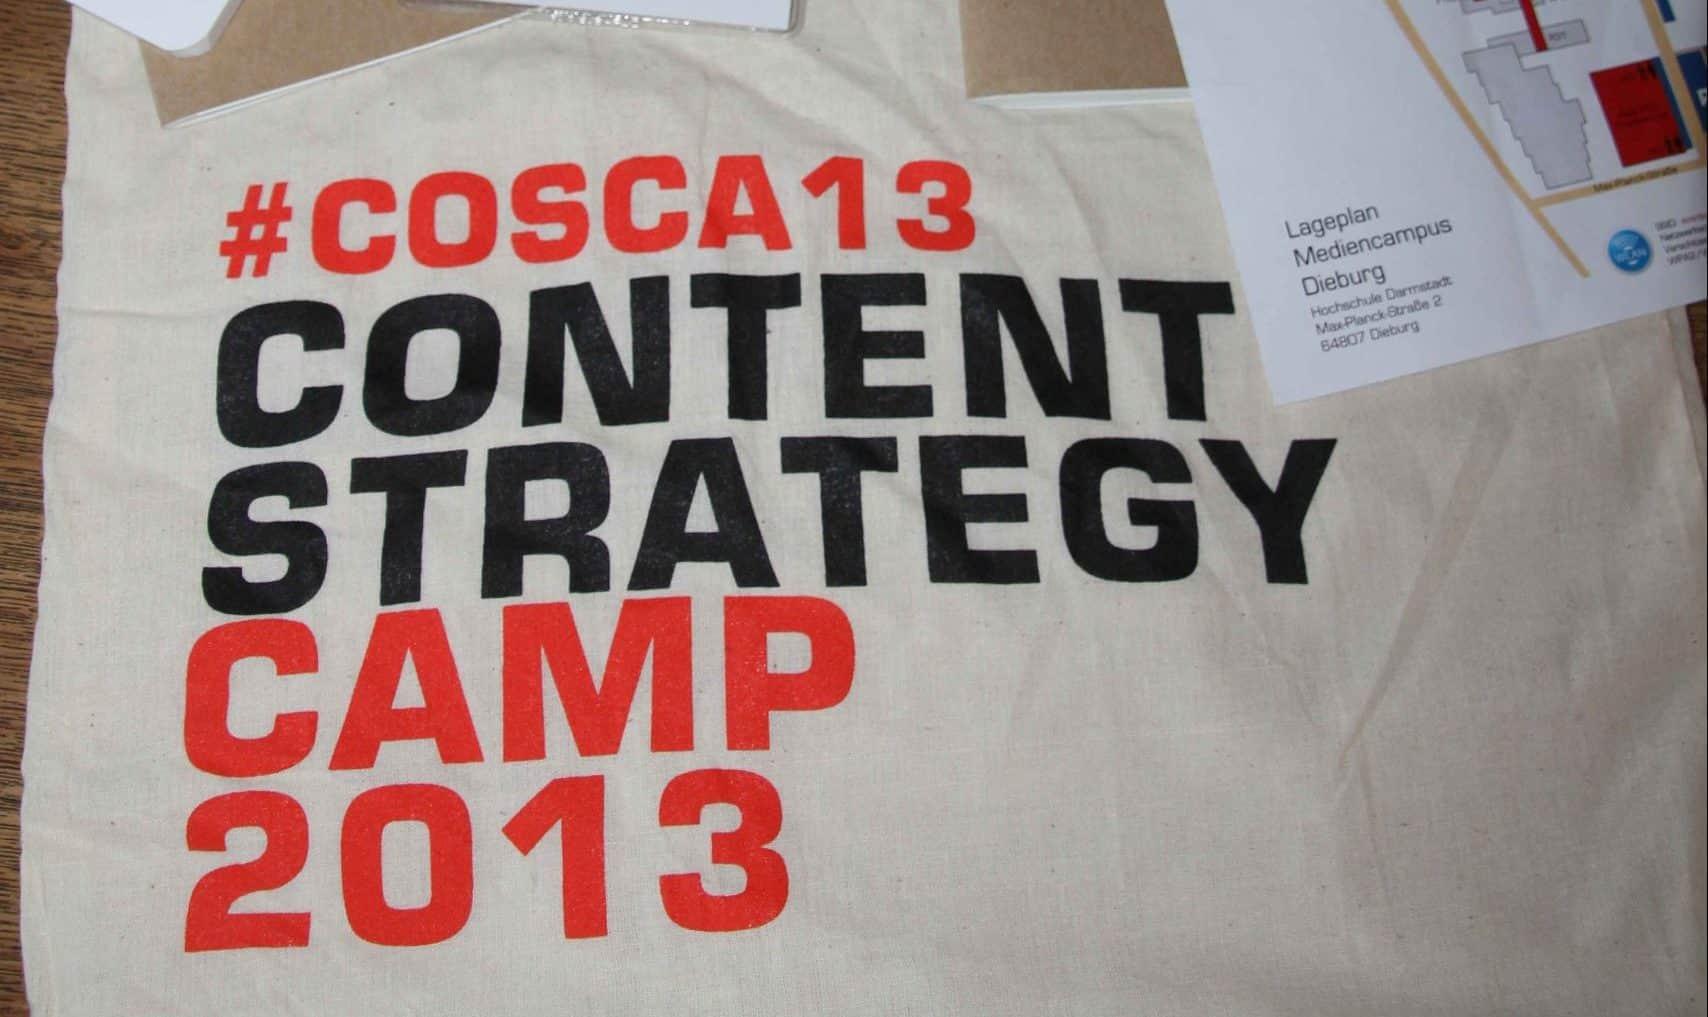 #cosca13: Content Strategy Camp in Darmstadt-Dieburg